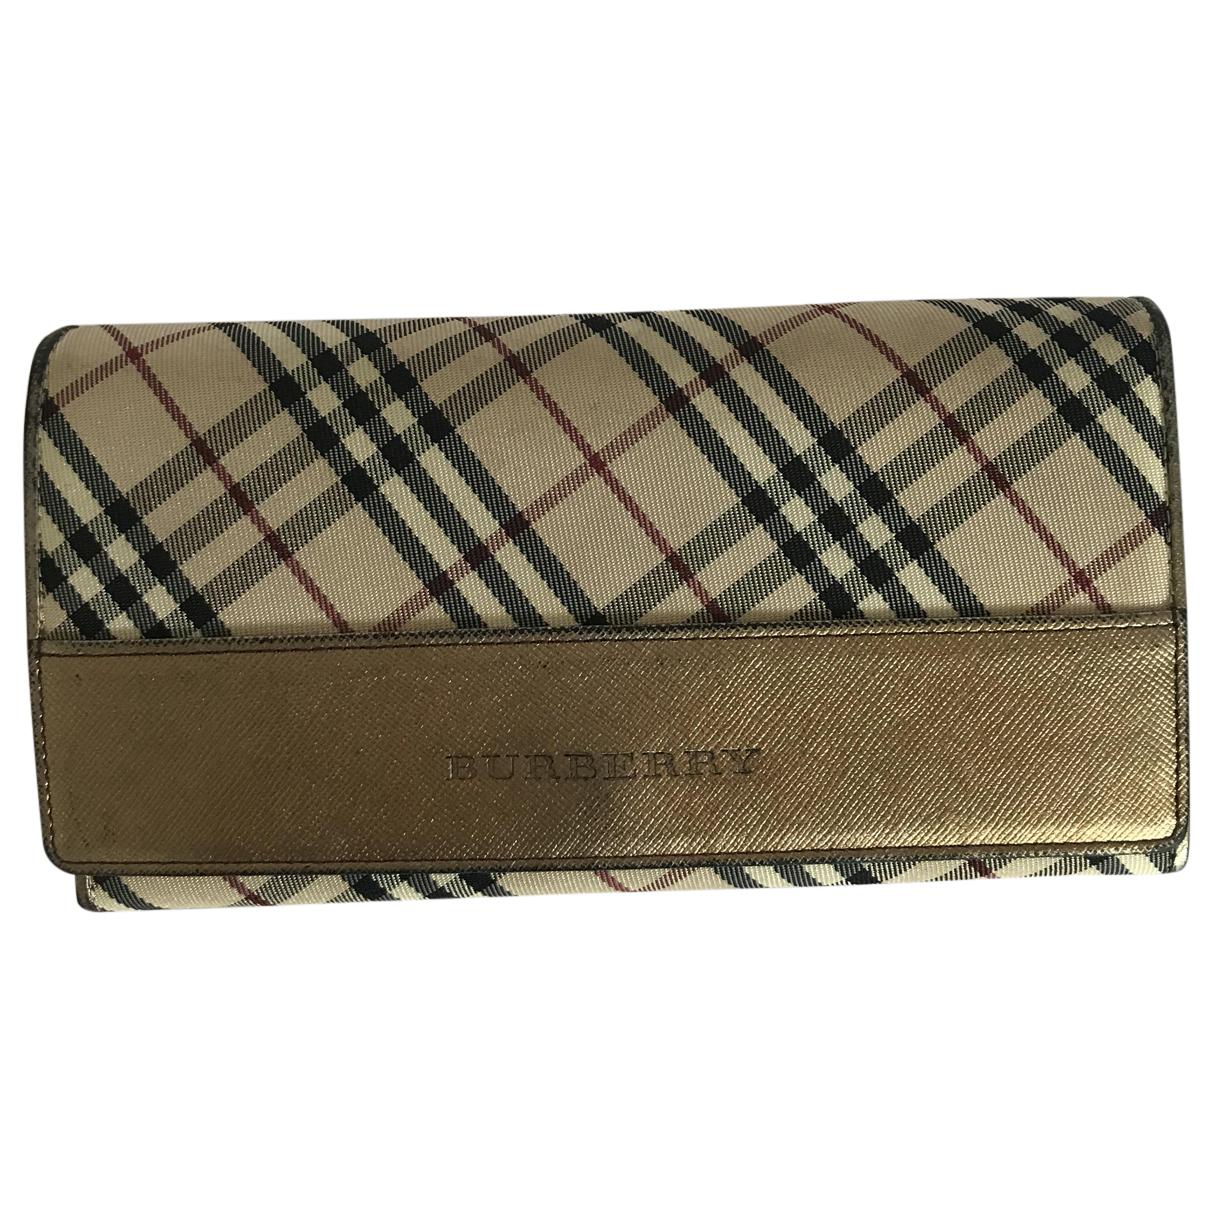 Burberry N Beige wallet for Women N